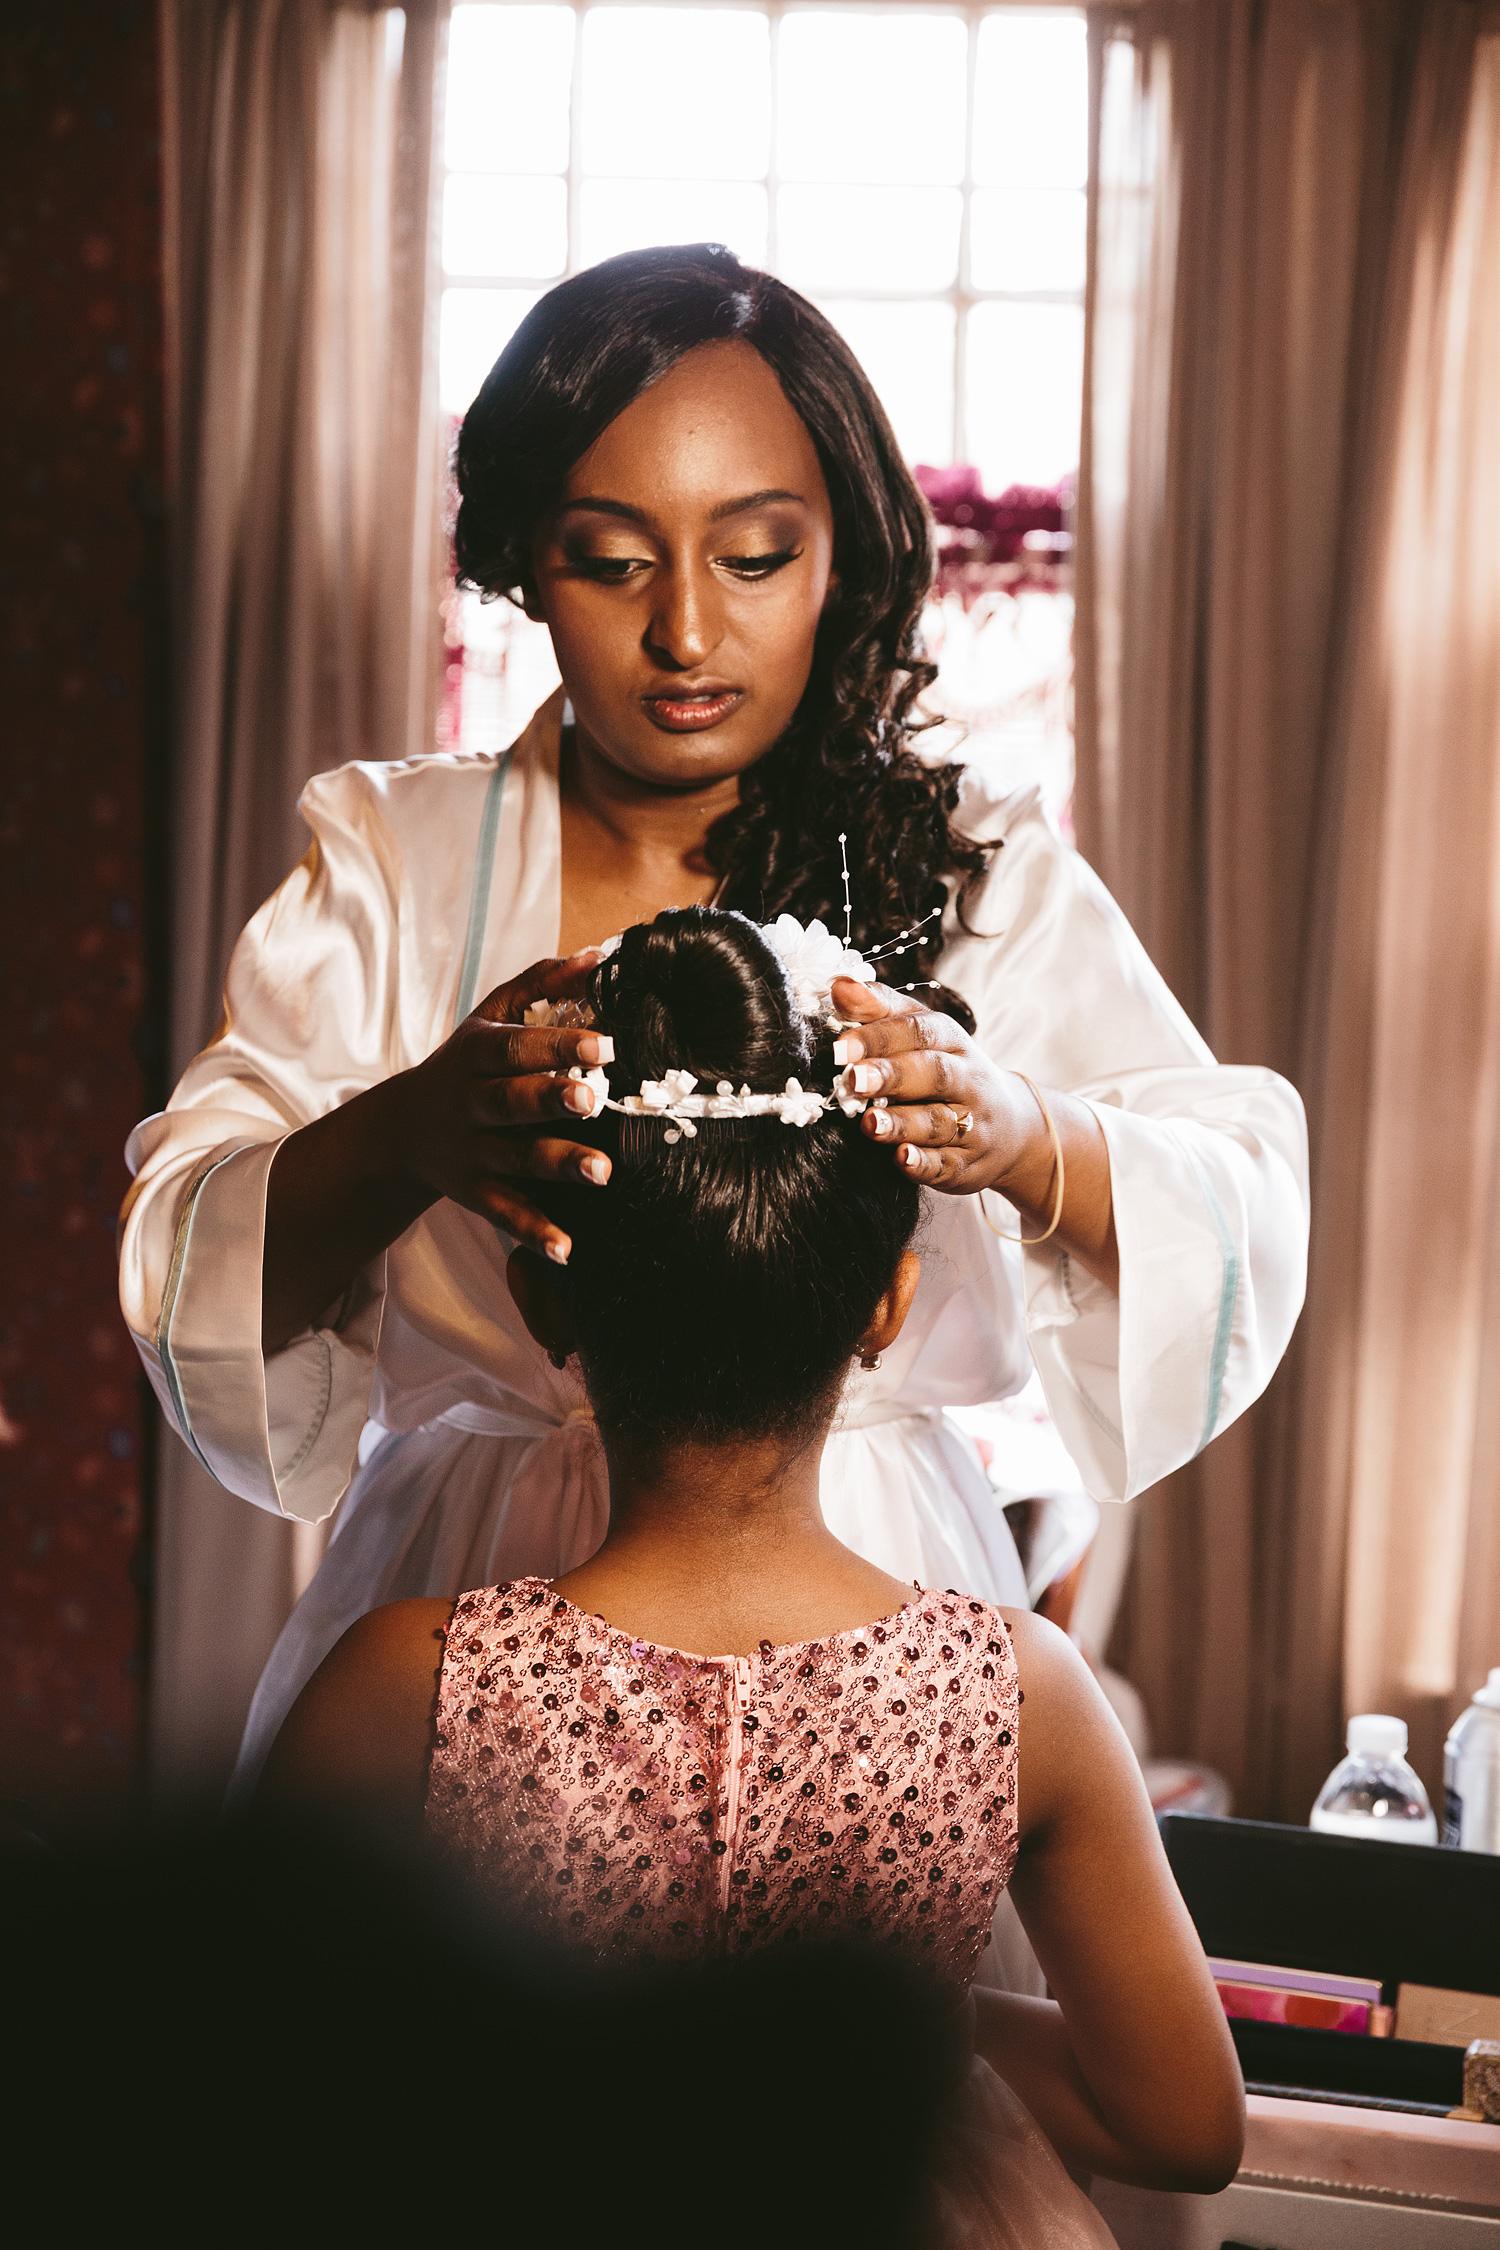 downtown-cleveland-ohio-ethiopian-wedding-photographers_24.jpg